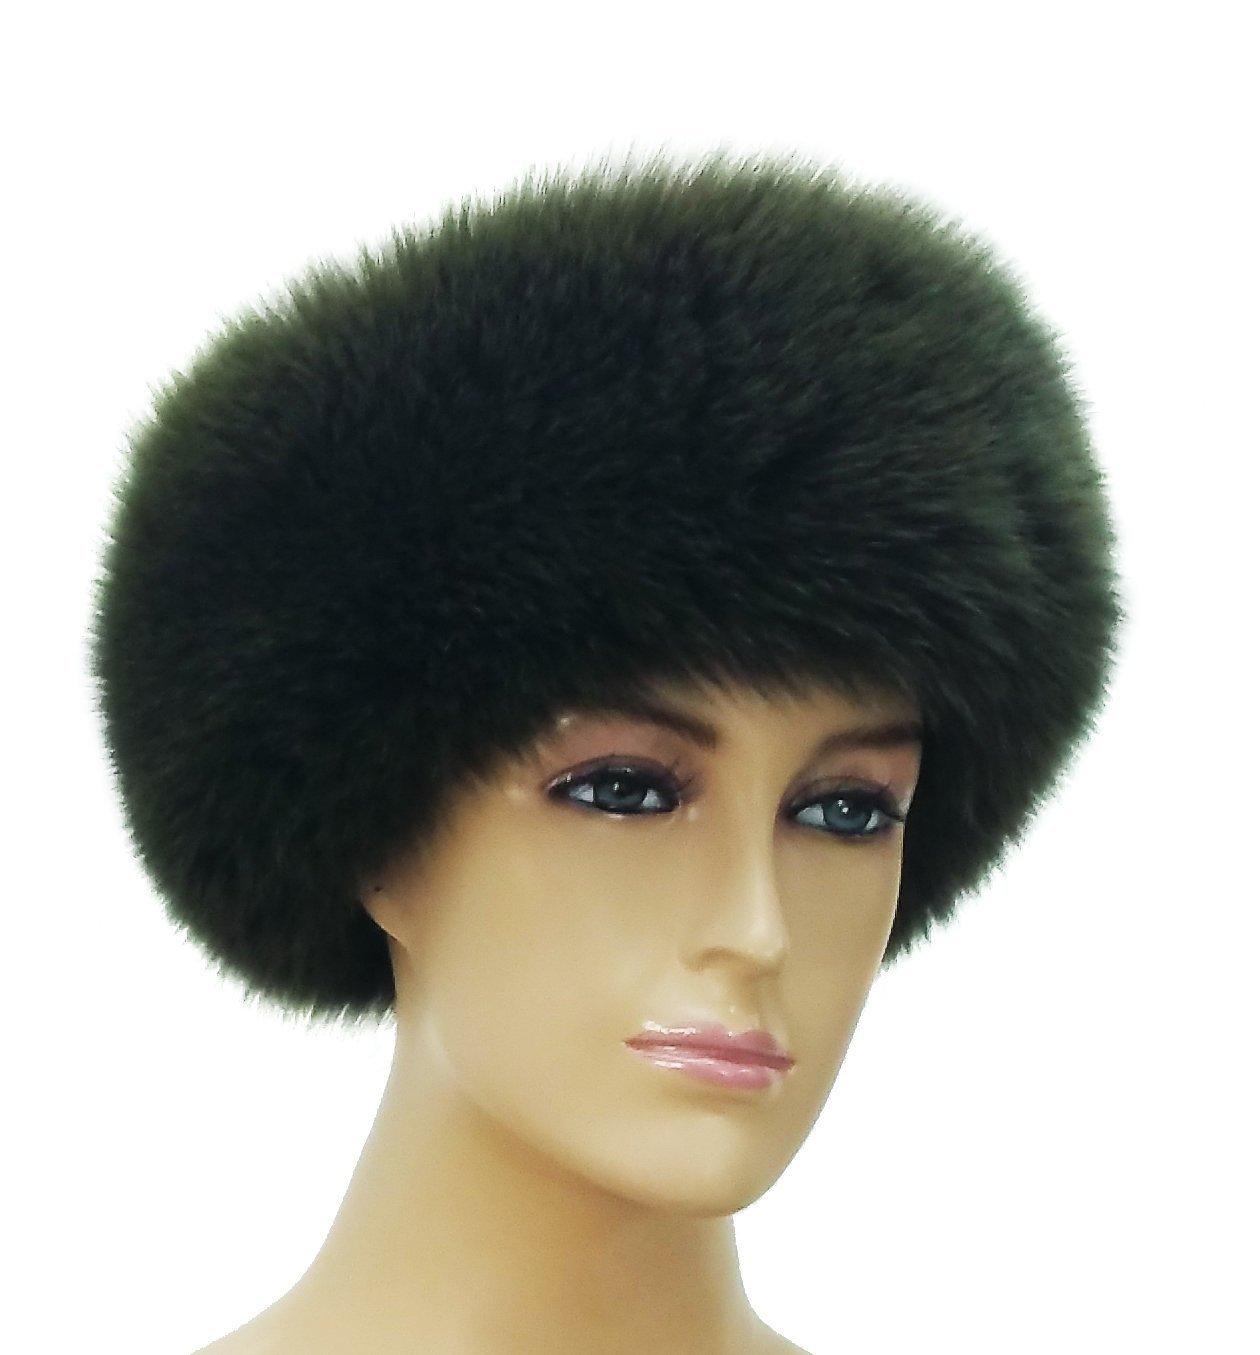 HIMA 100% Real Fox Fur Headband (Dark Olive Green) by Hima